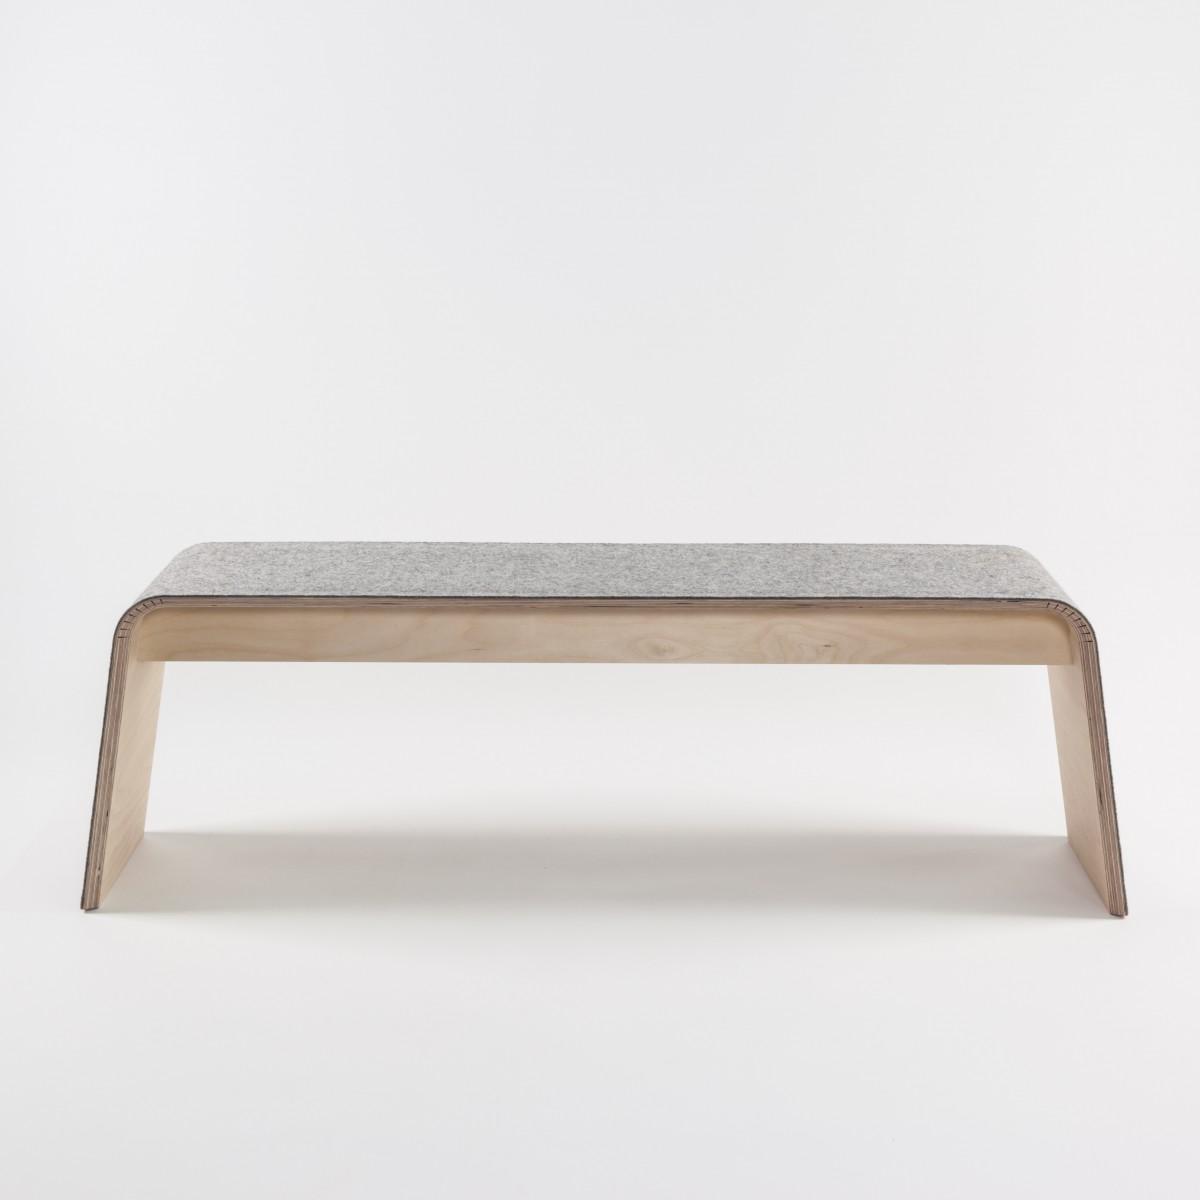 STADIG.stubenbank 140cm Design Sitzbank aus Holz mit Wollfilz